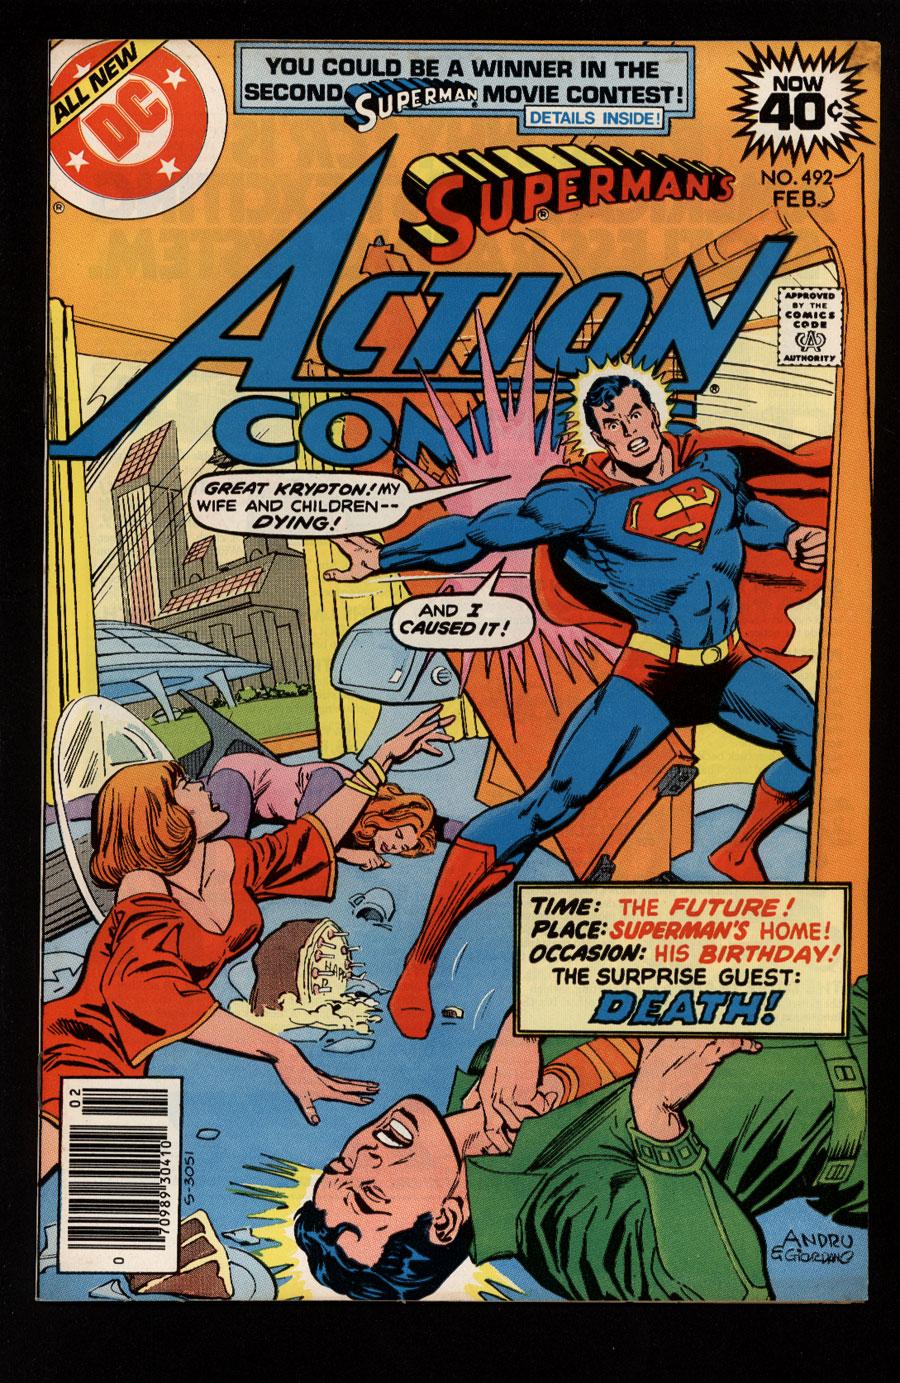 1938 Series 9.2 #821 January 2005 DC NM Action Comics